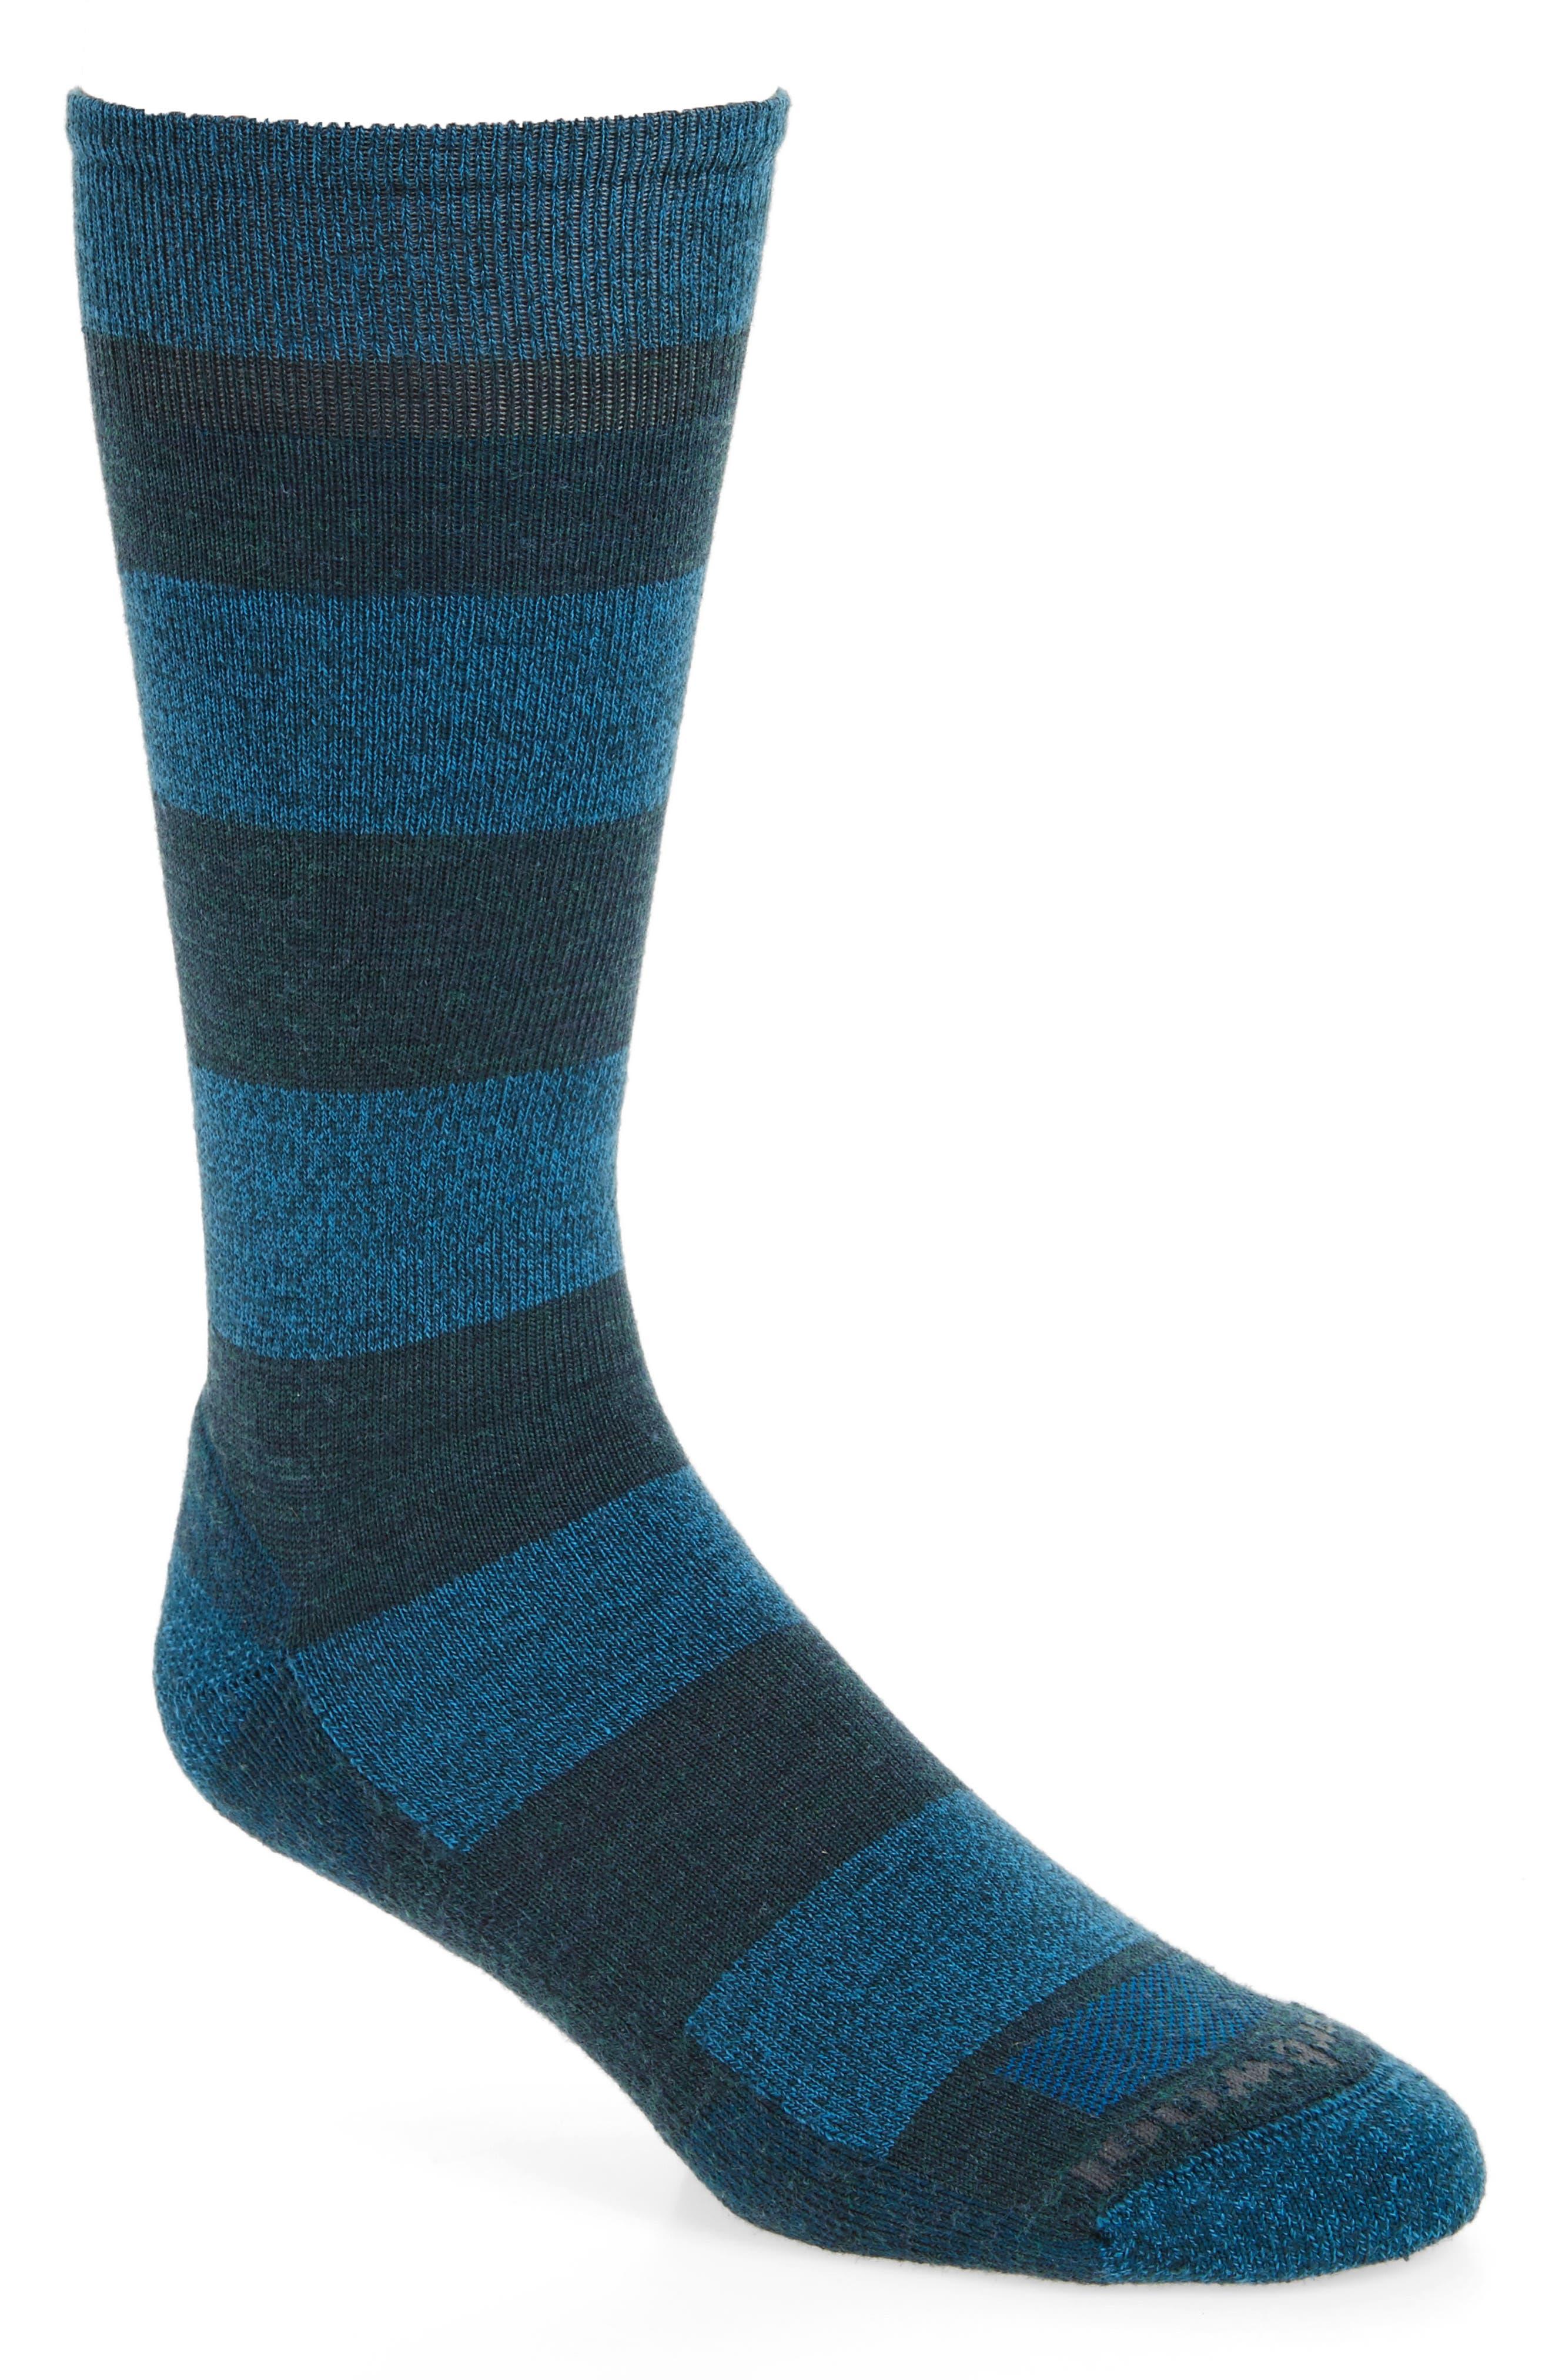 Smartwool Gimsby Stripe Socks